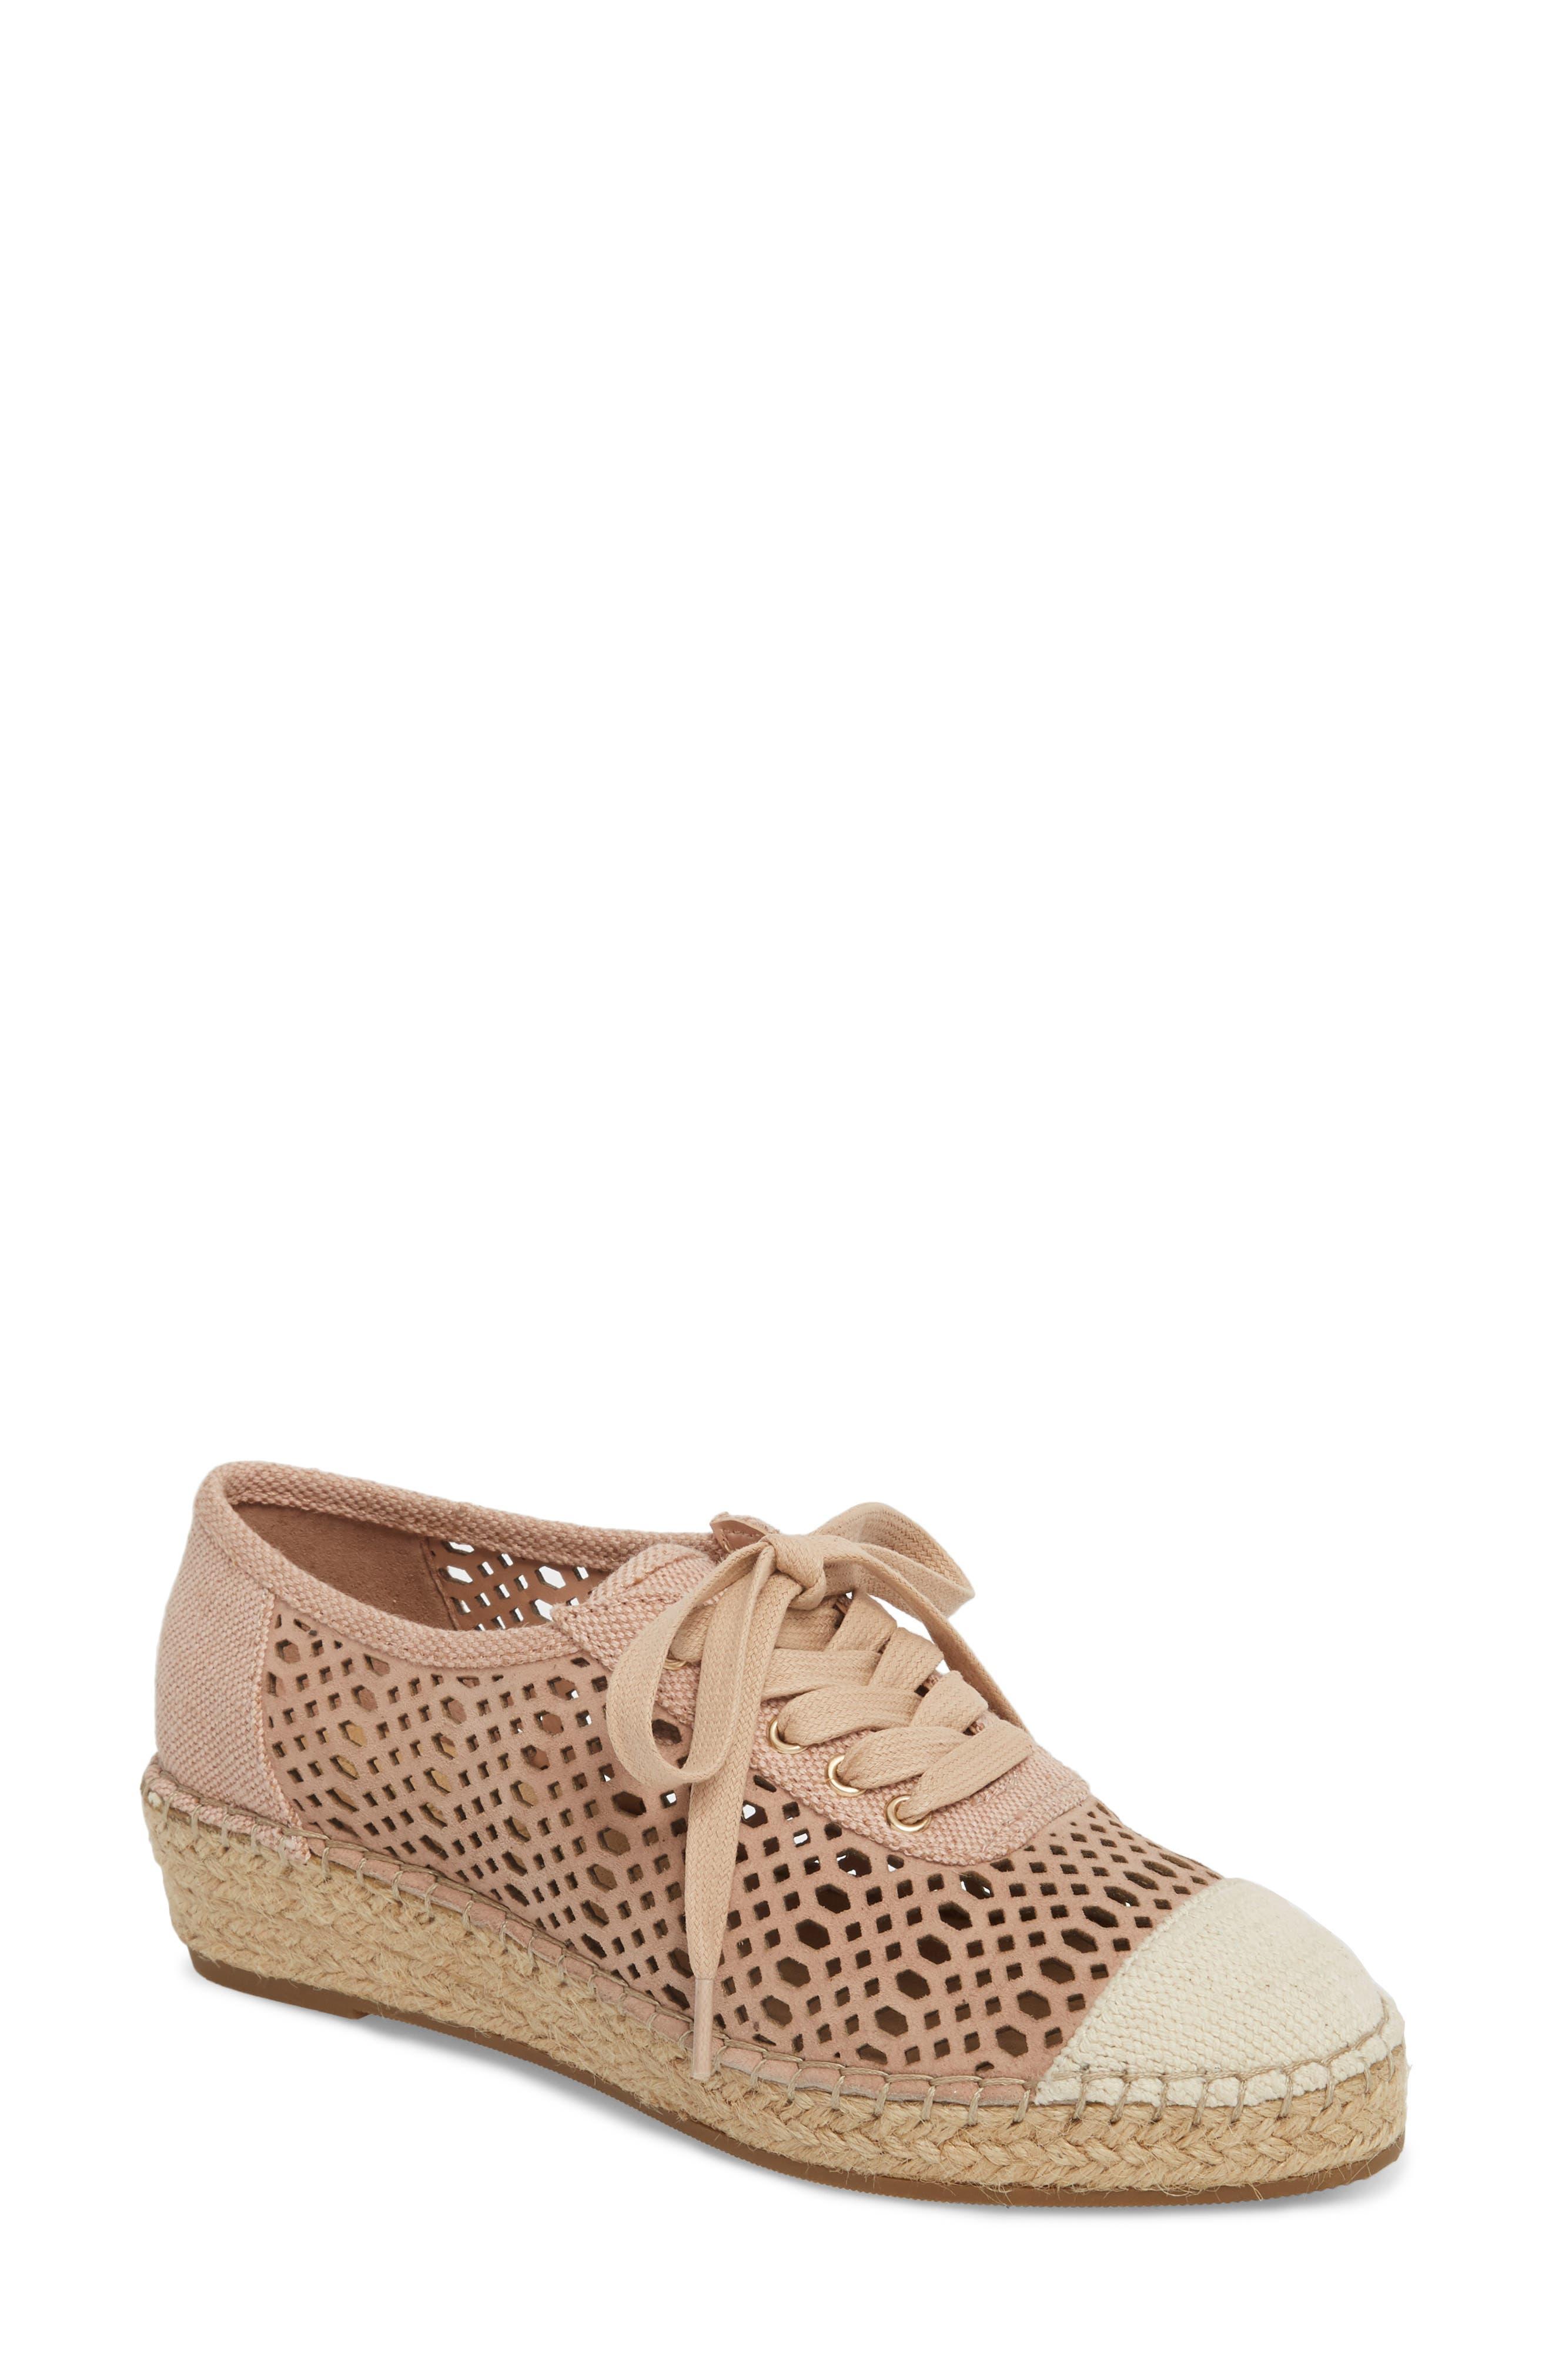 Clementine Espadrille Sneaker,                         Main,                         color, Blush Suede